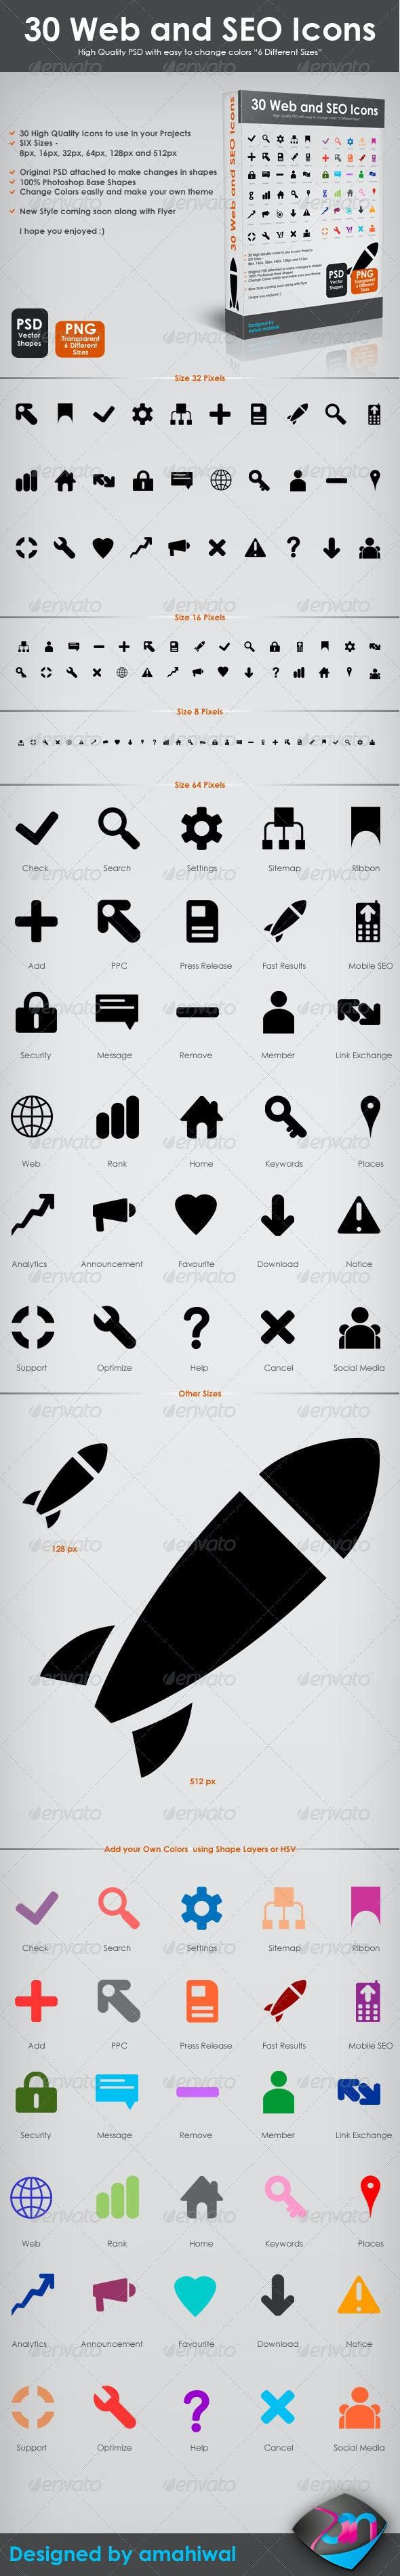 30 Web and SEO Icons - Web Icons